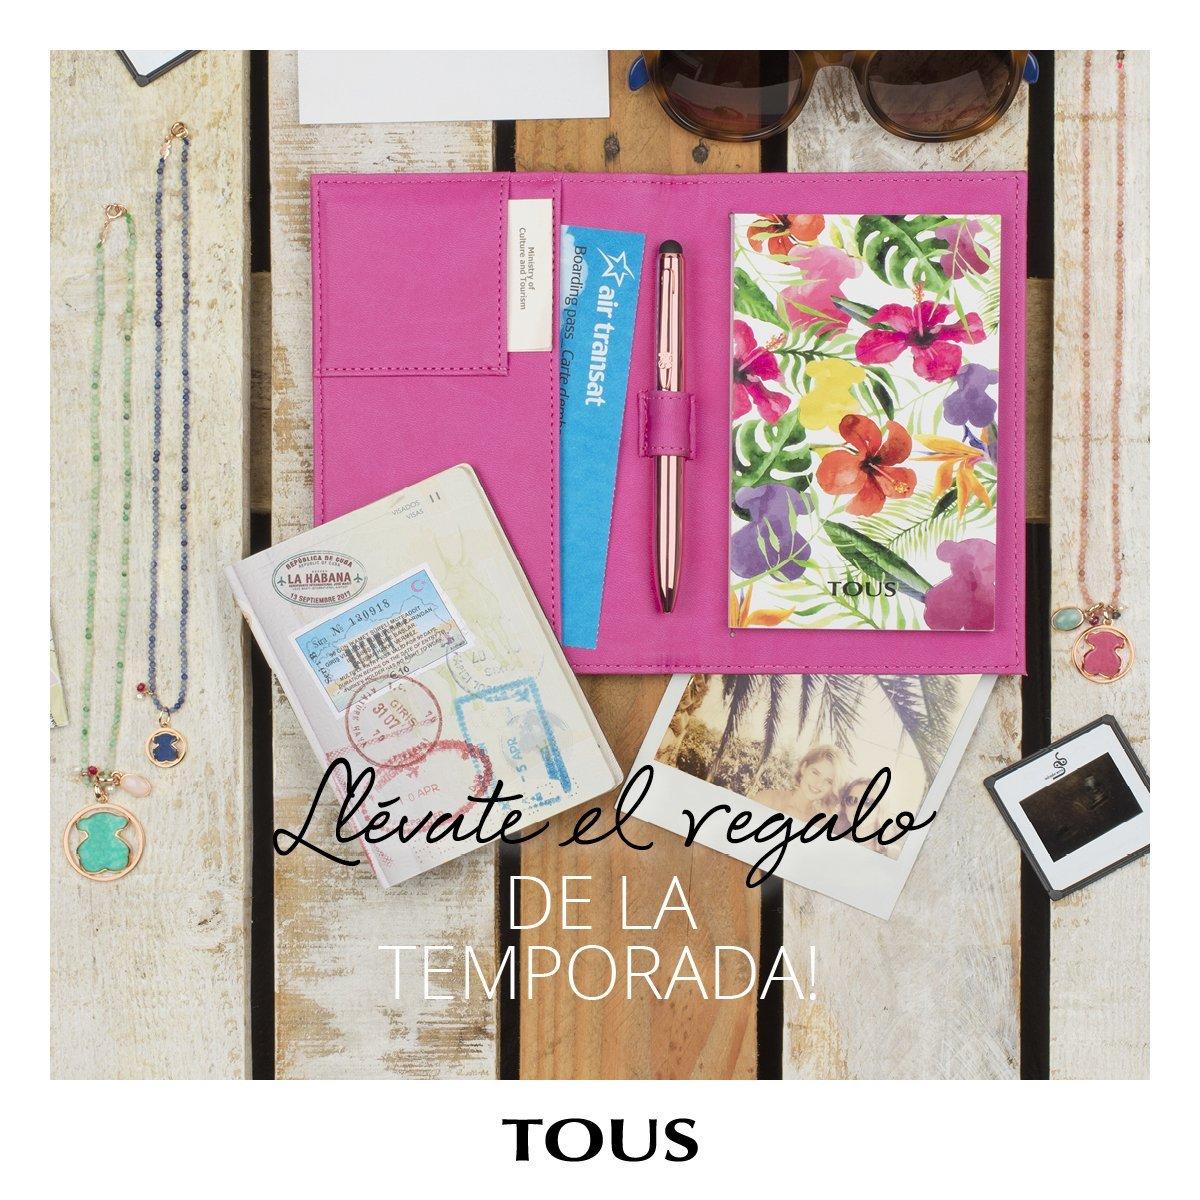 Esta primavera, te regalamos un exclusivo porta-documentos para #TOUSLovers